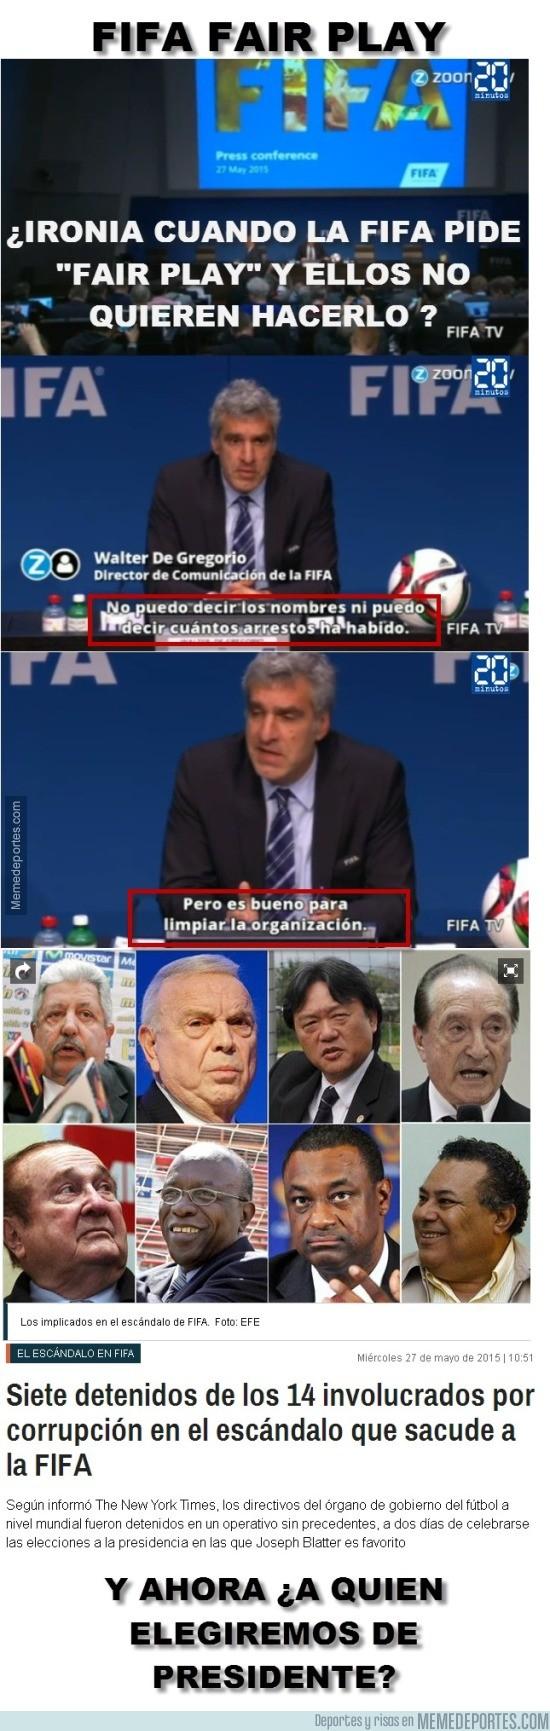 563697 - La FIFA exige pero no da Fair Play